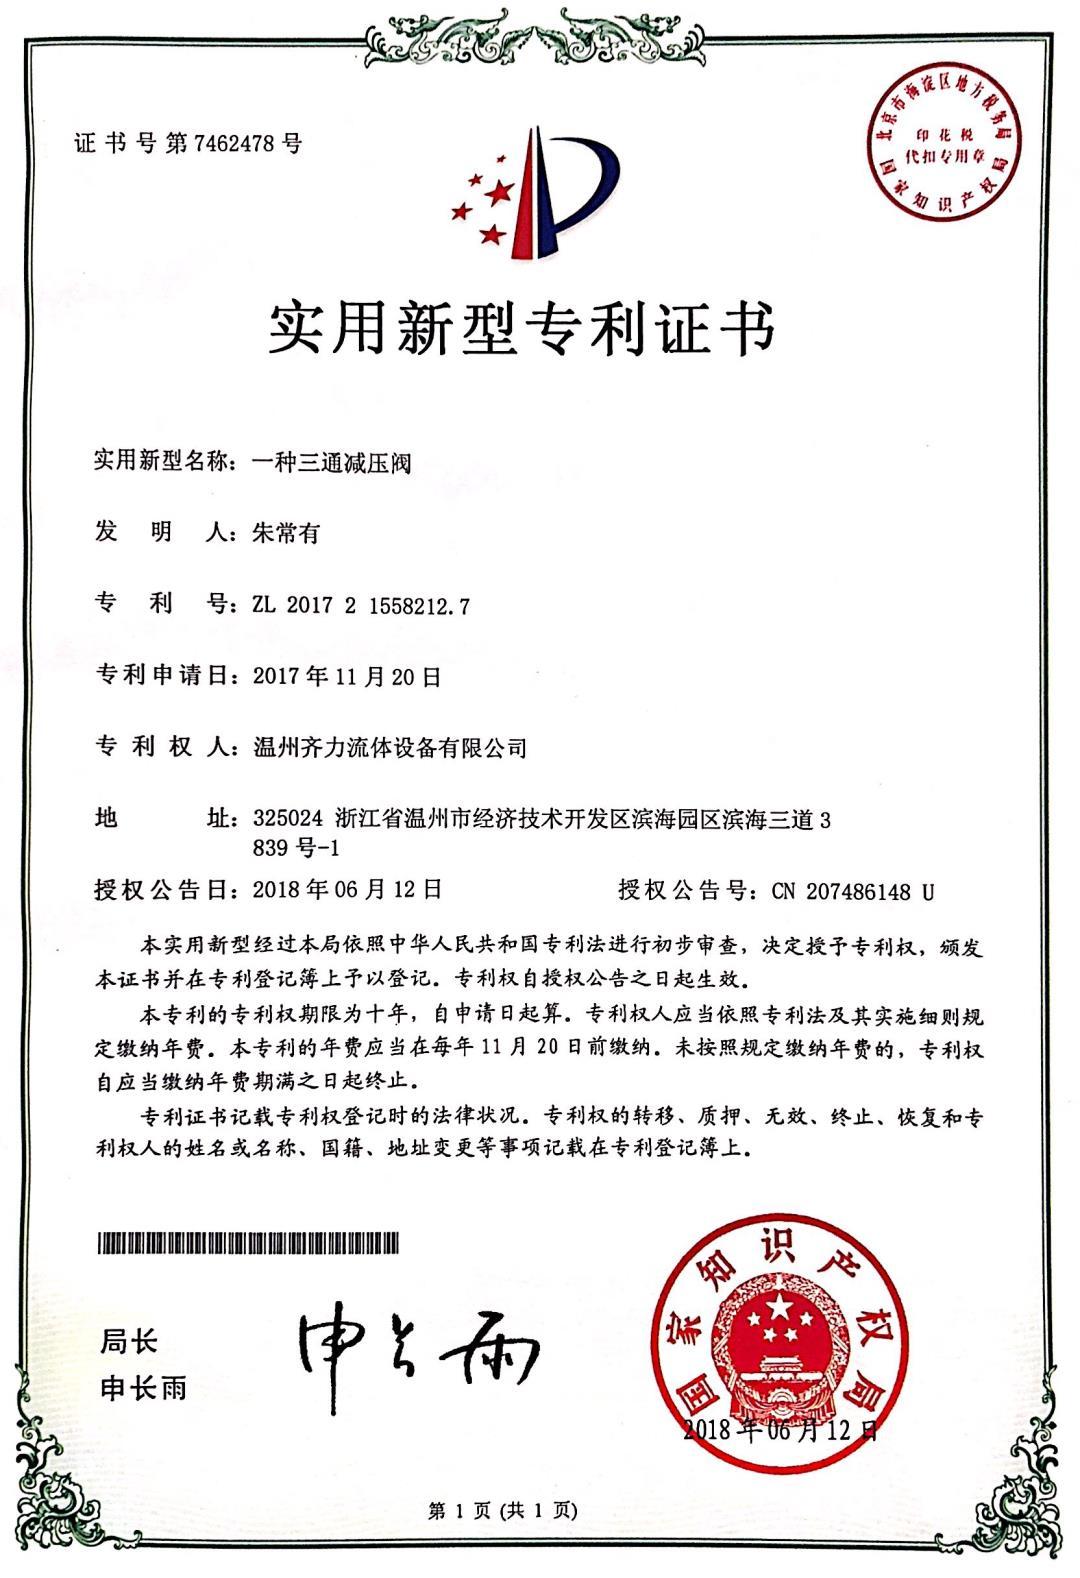 2018 JUN【贺!公司10项专利证书到手啦】